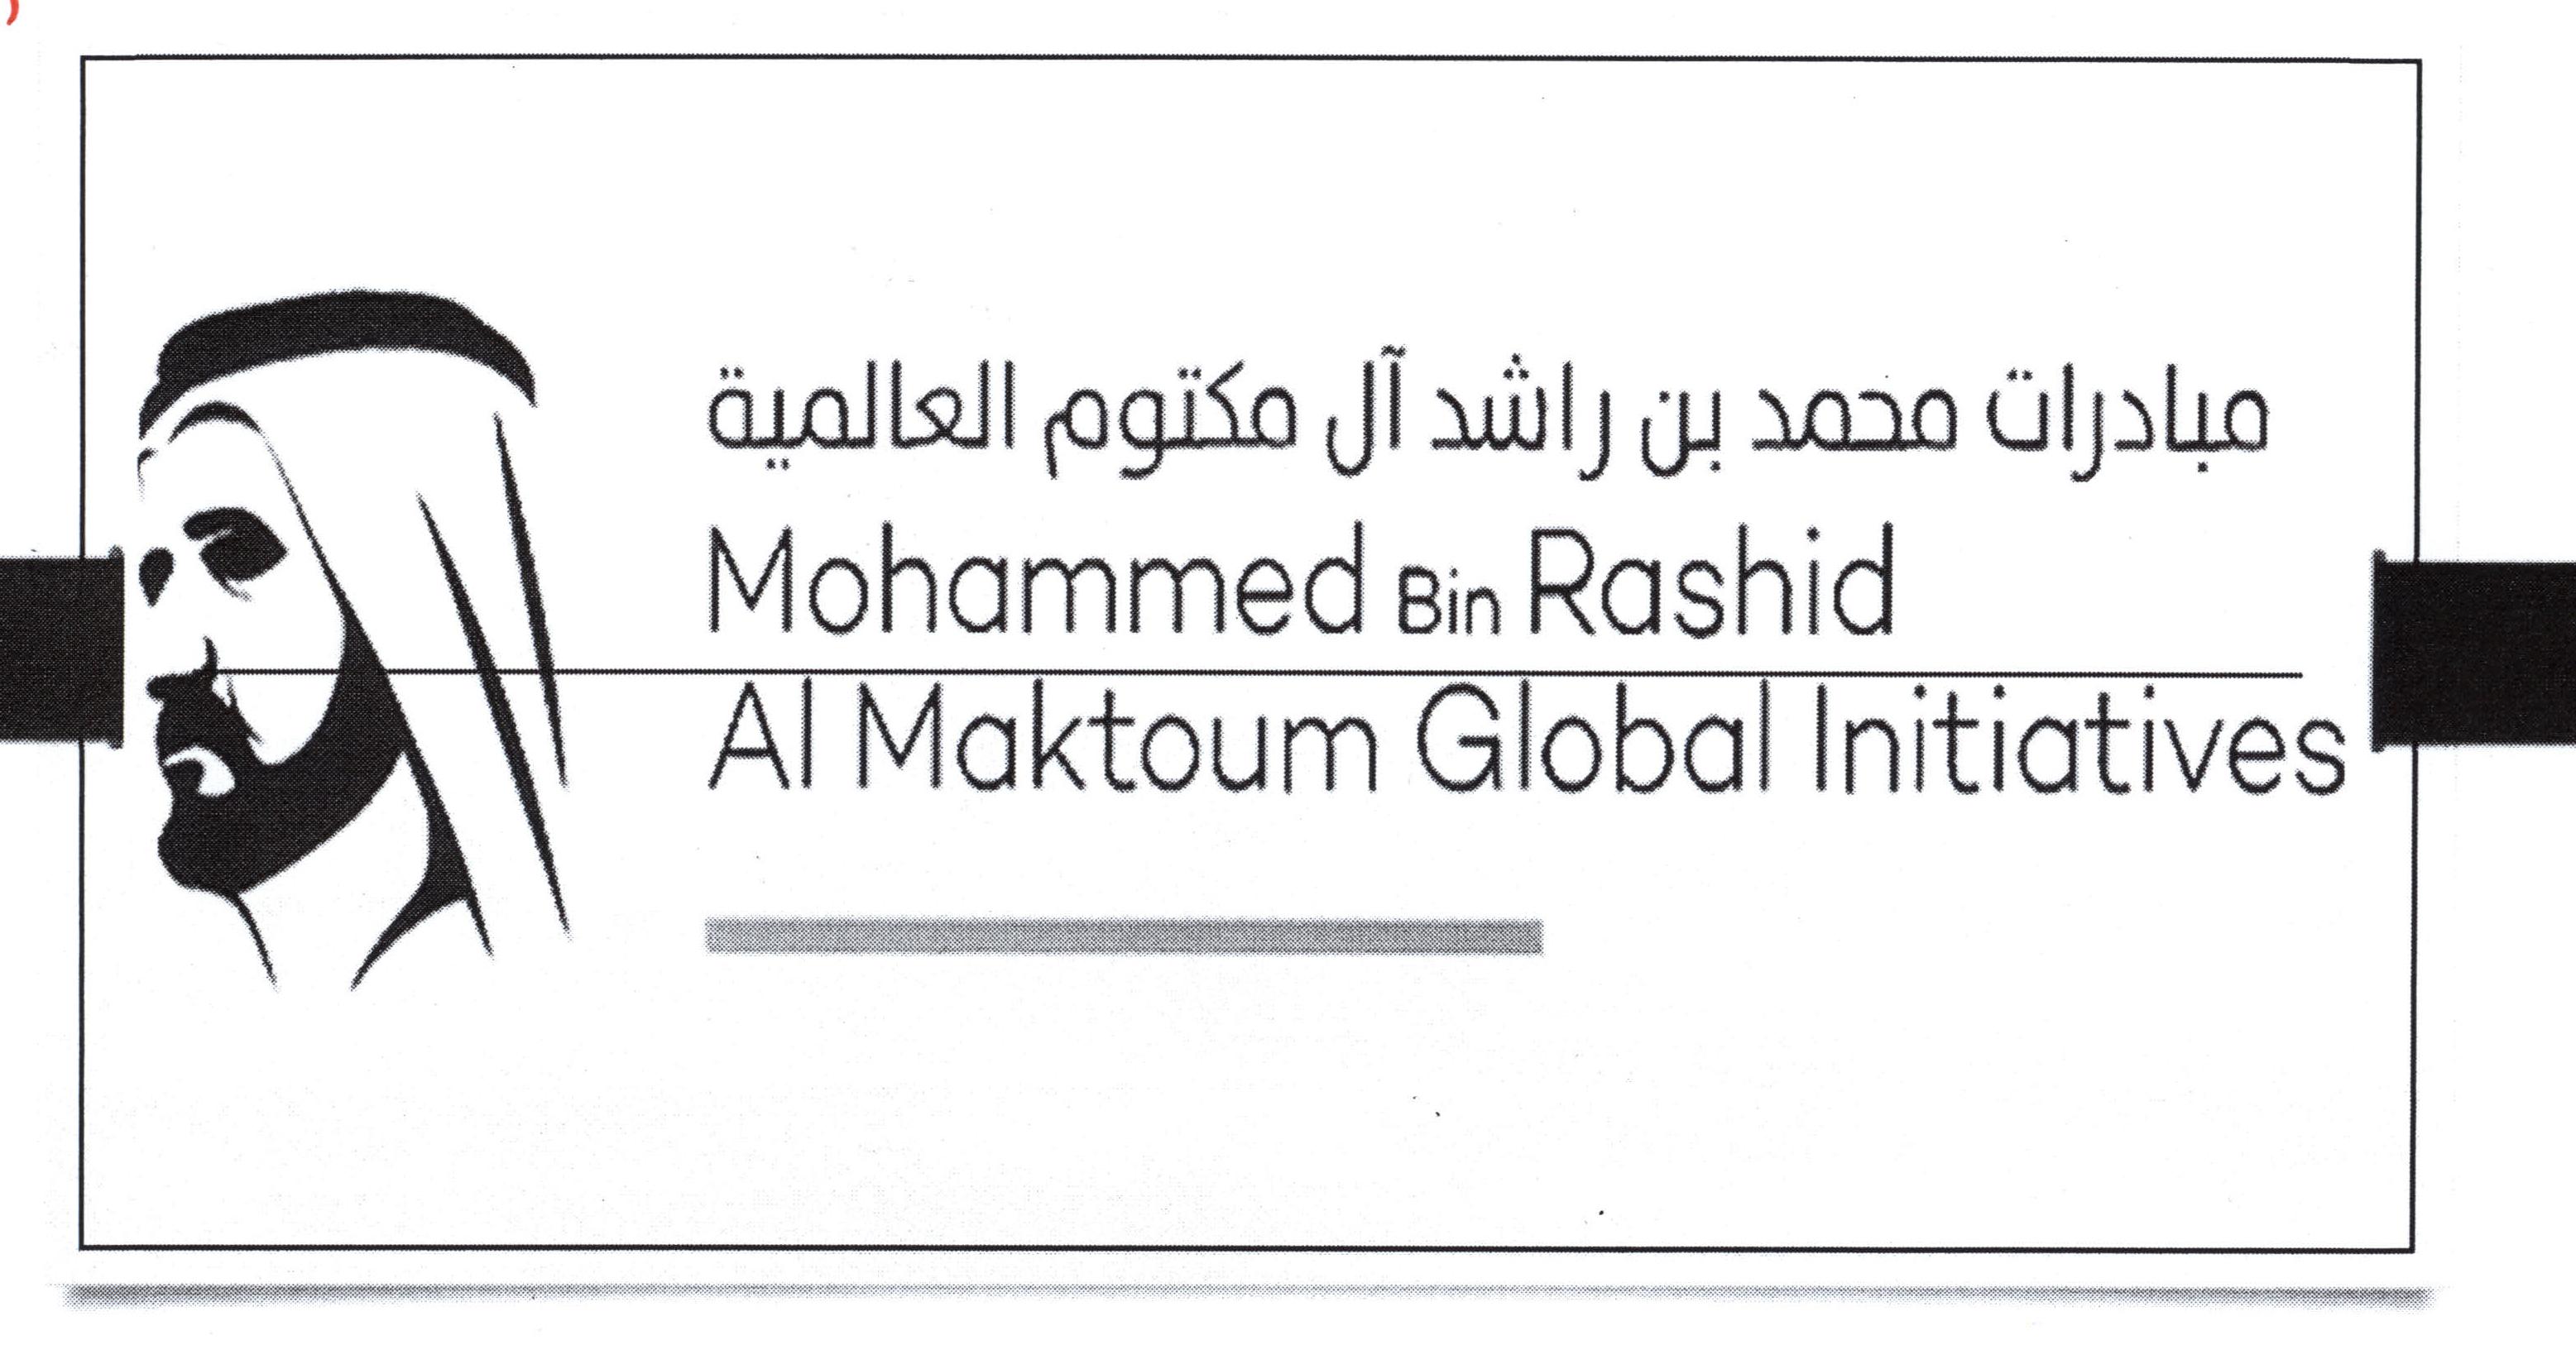 Mohammed Bin Rashid Al Maktoum International Initiatives